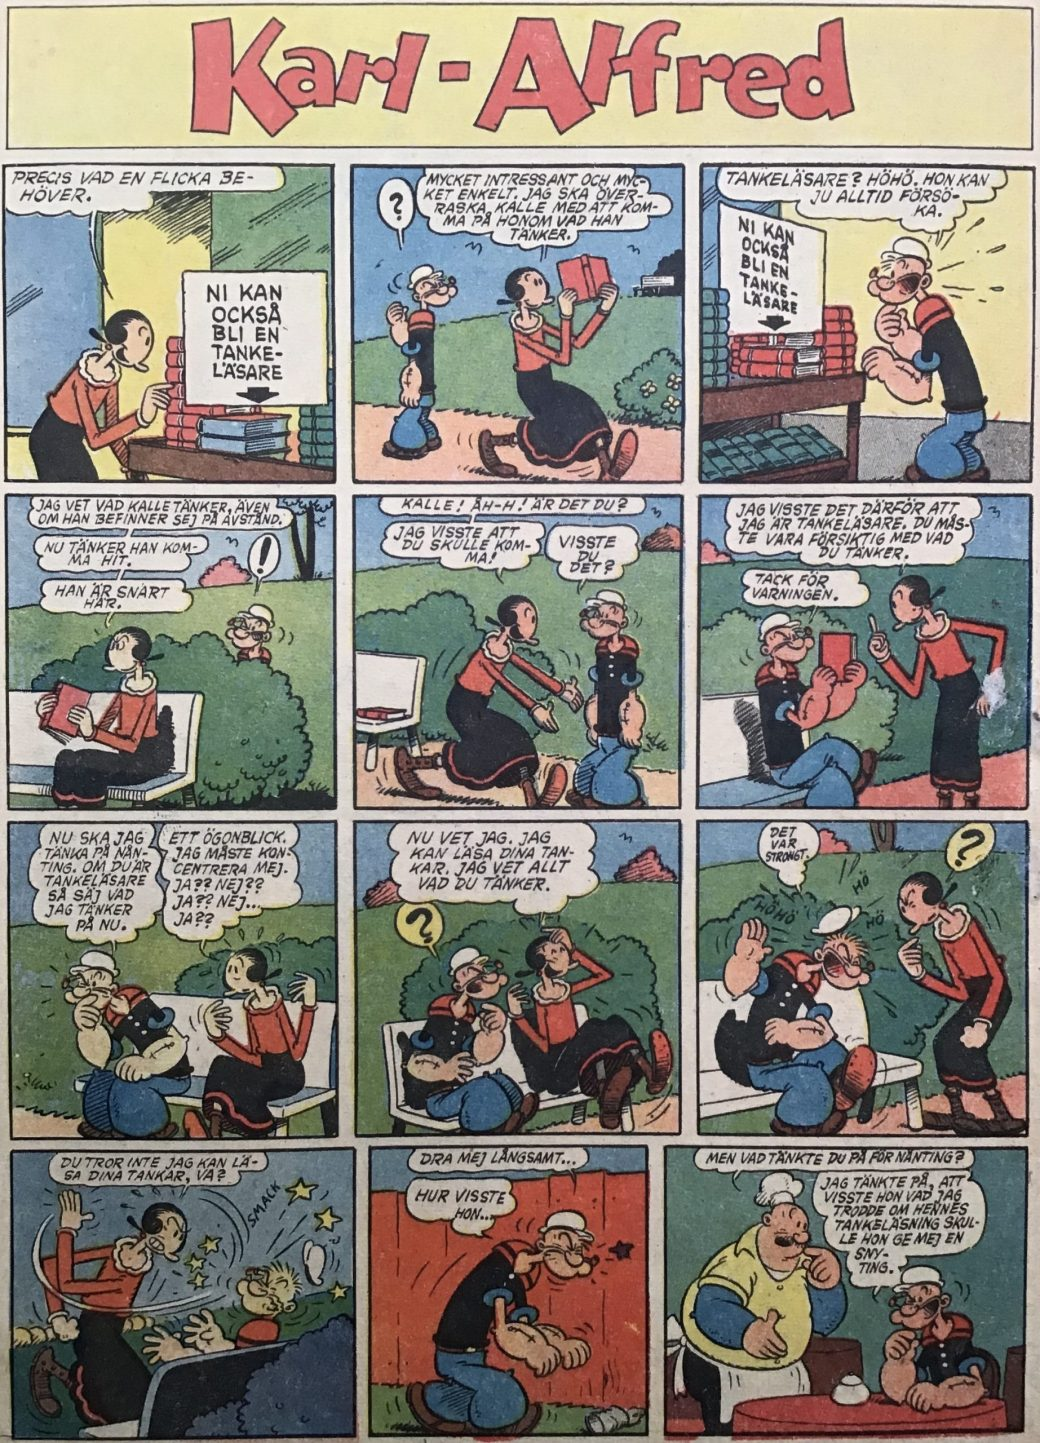 Serien Karl-Alfred iserietidningen Karl-Alfred nr 1, 1953. ©Bulls